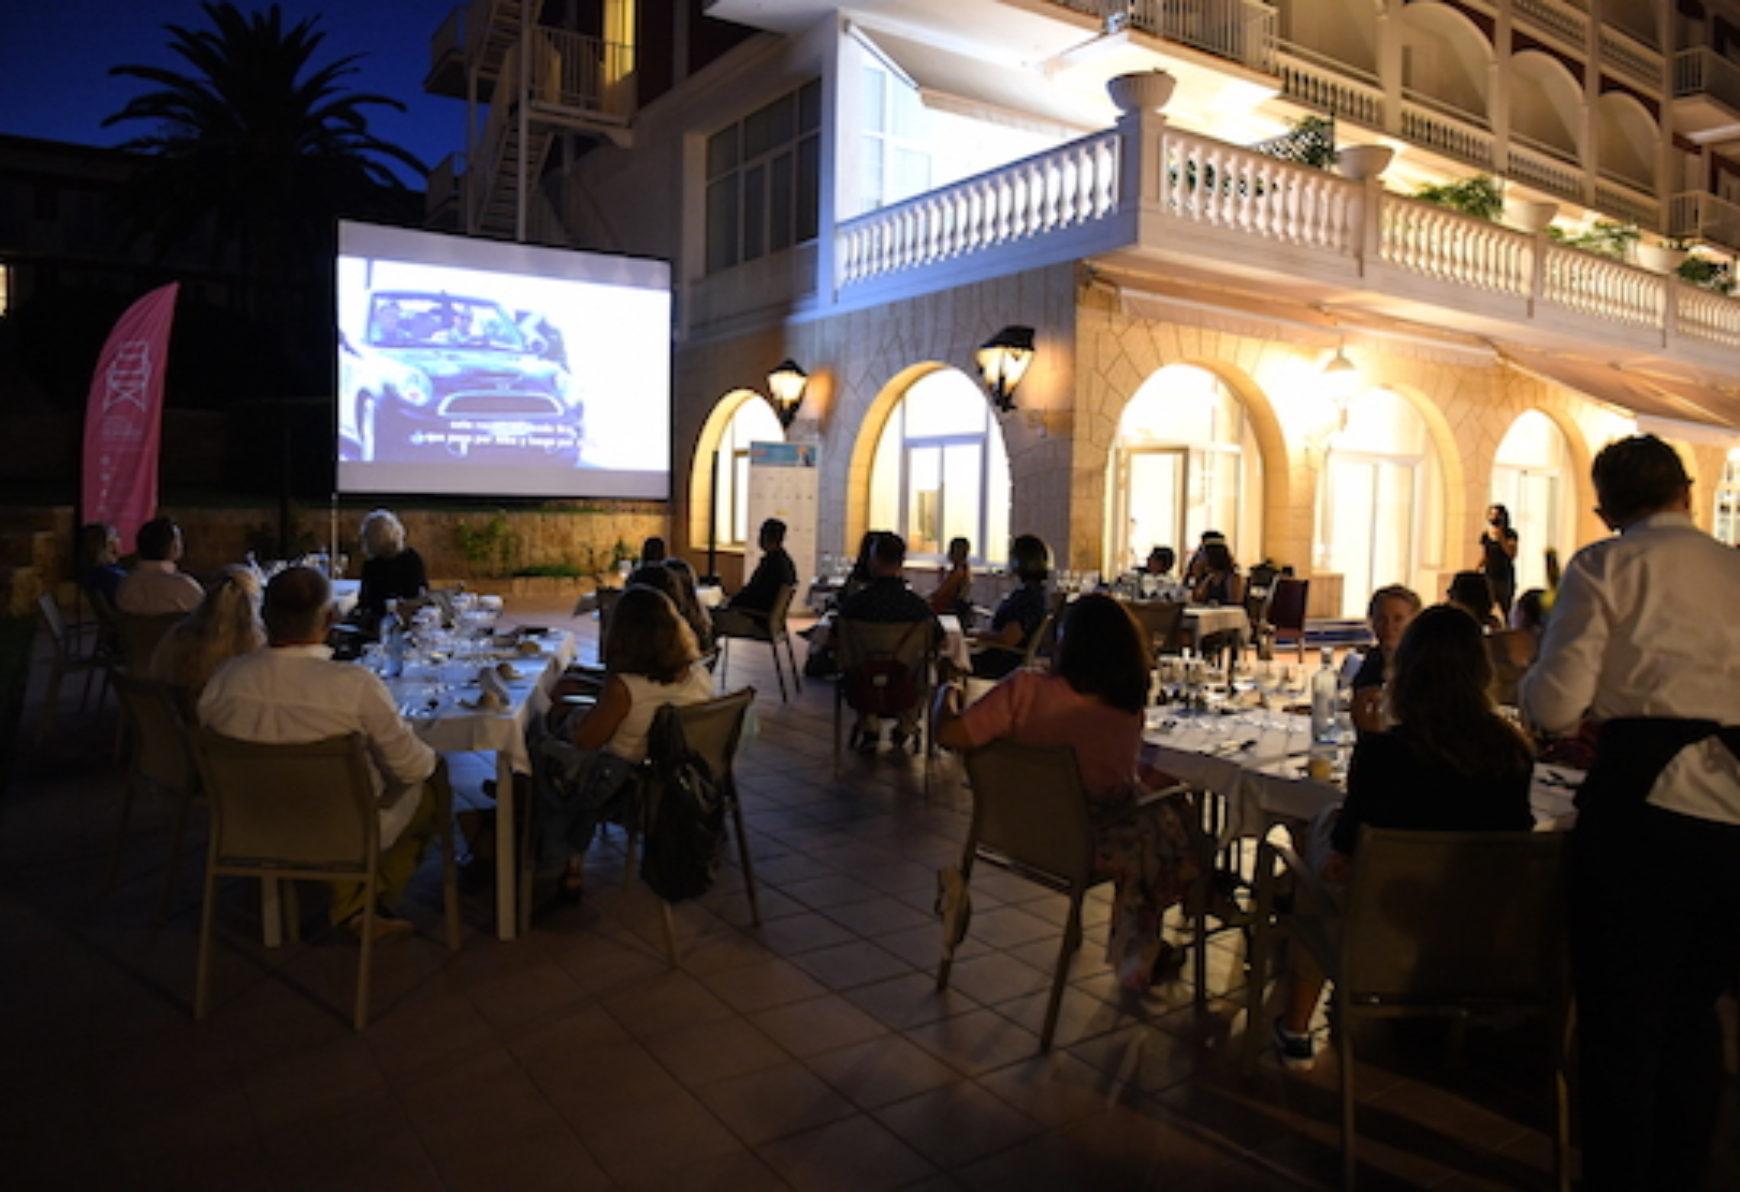 Menorca combines local cuisine, gastronomy and cinema